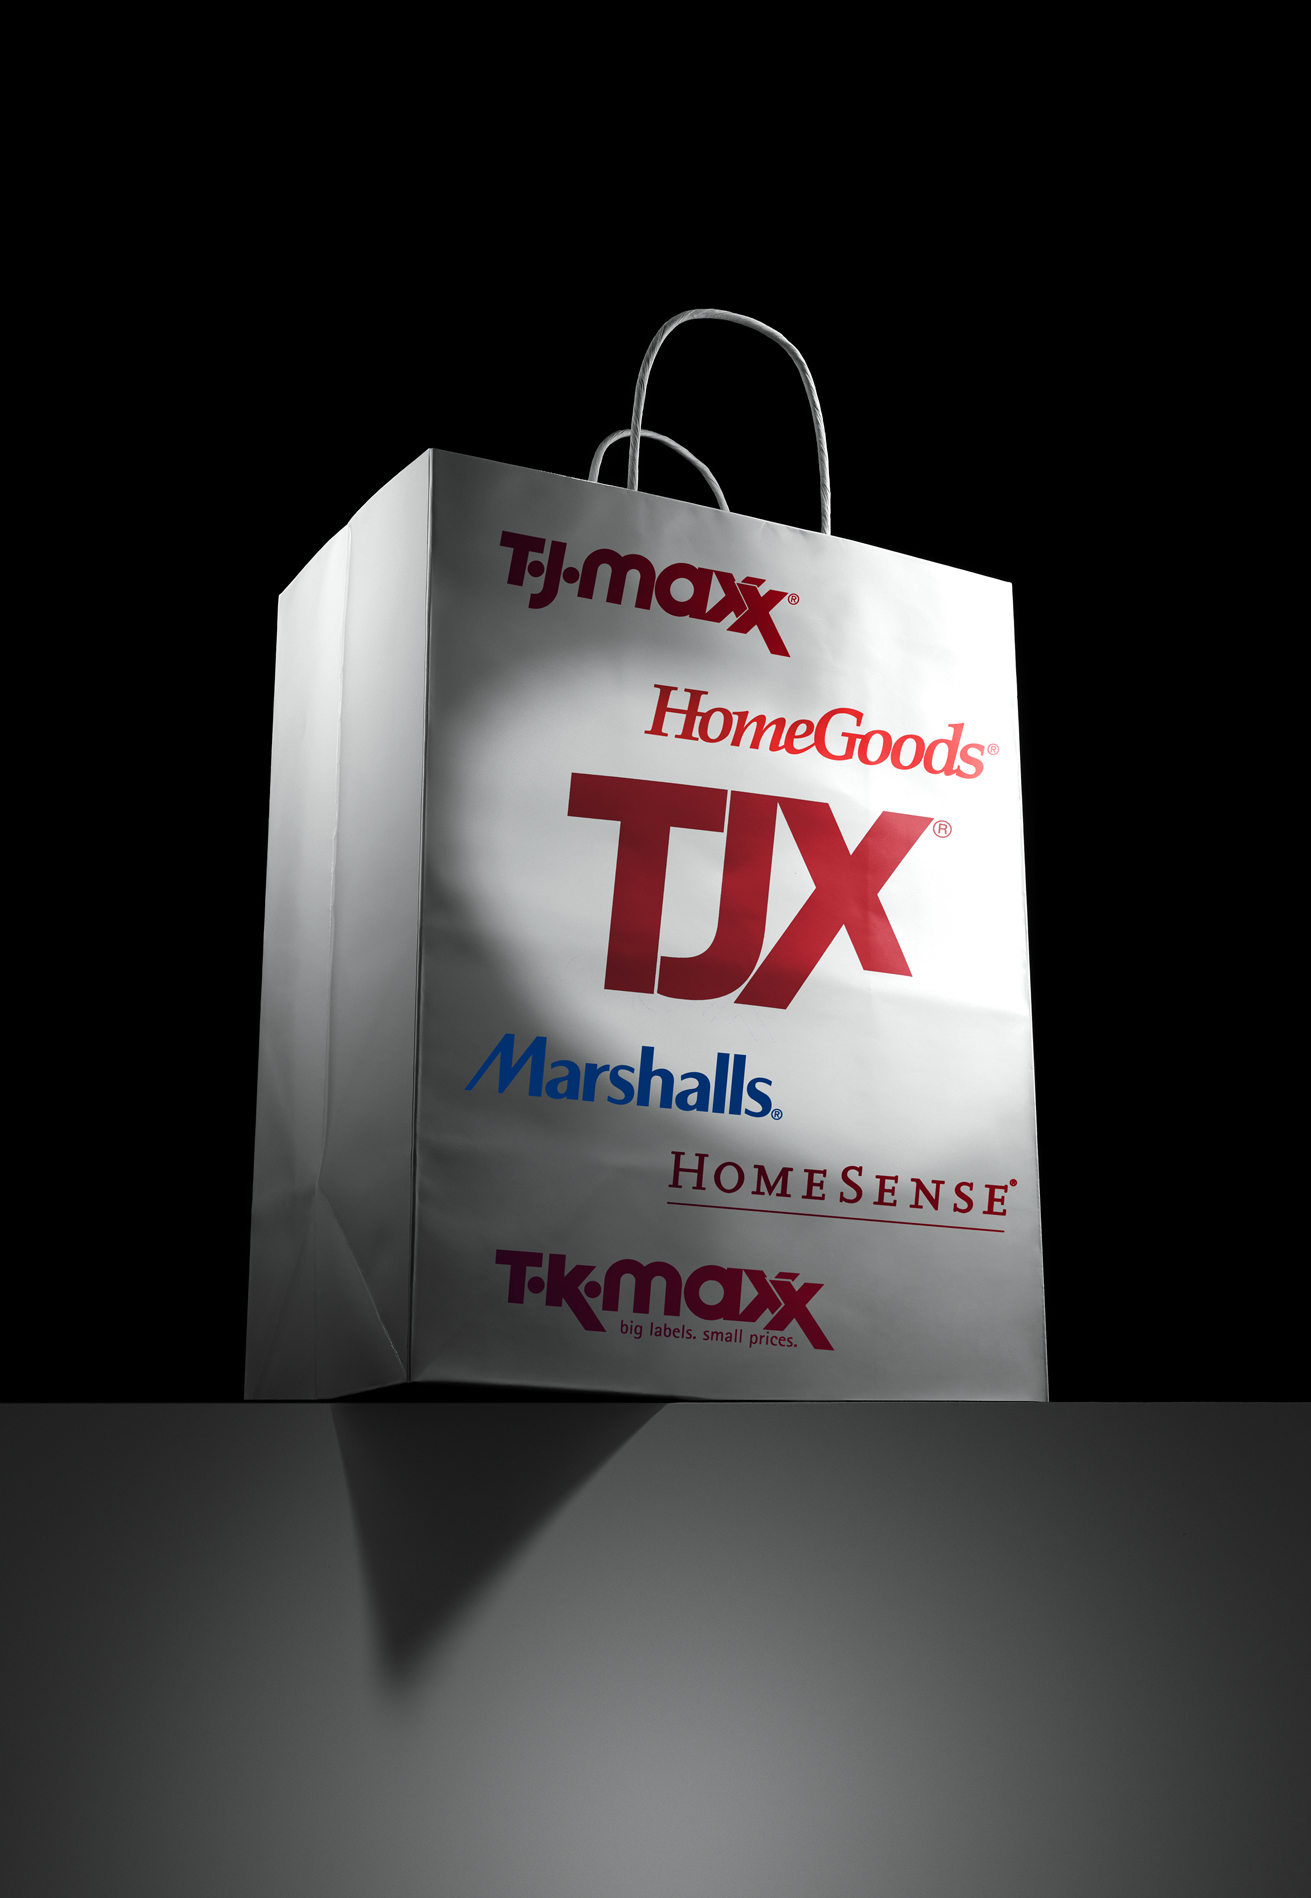 SHOPPING BAG WITH SEVERAL LOGOS: TJ MAXX, HOMEGOODS, MARSHALLS, HOMESENSE, TK MAXX